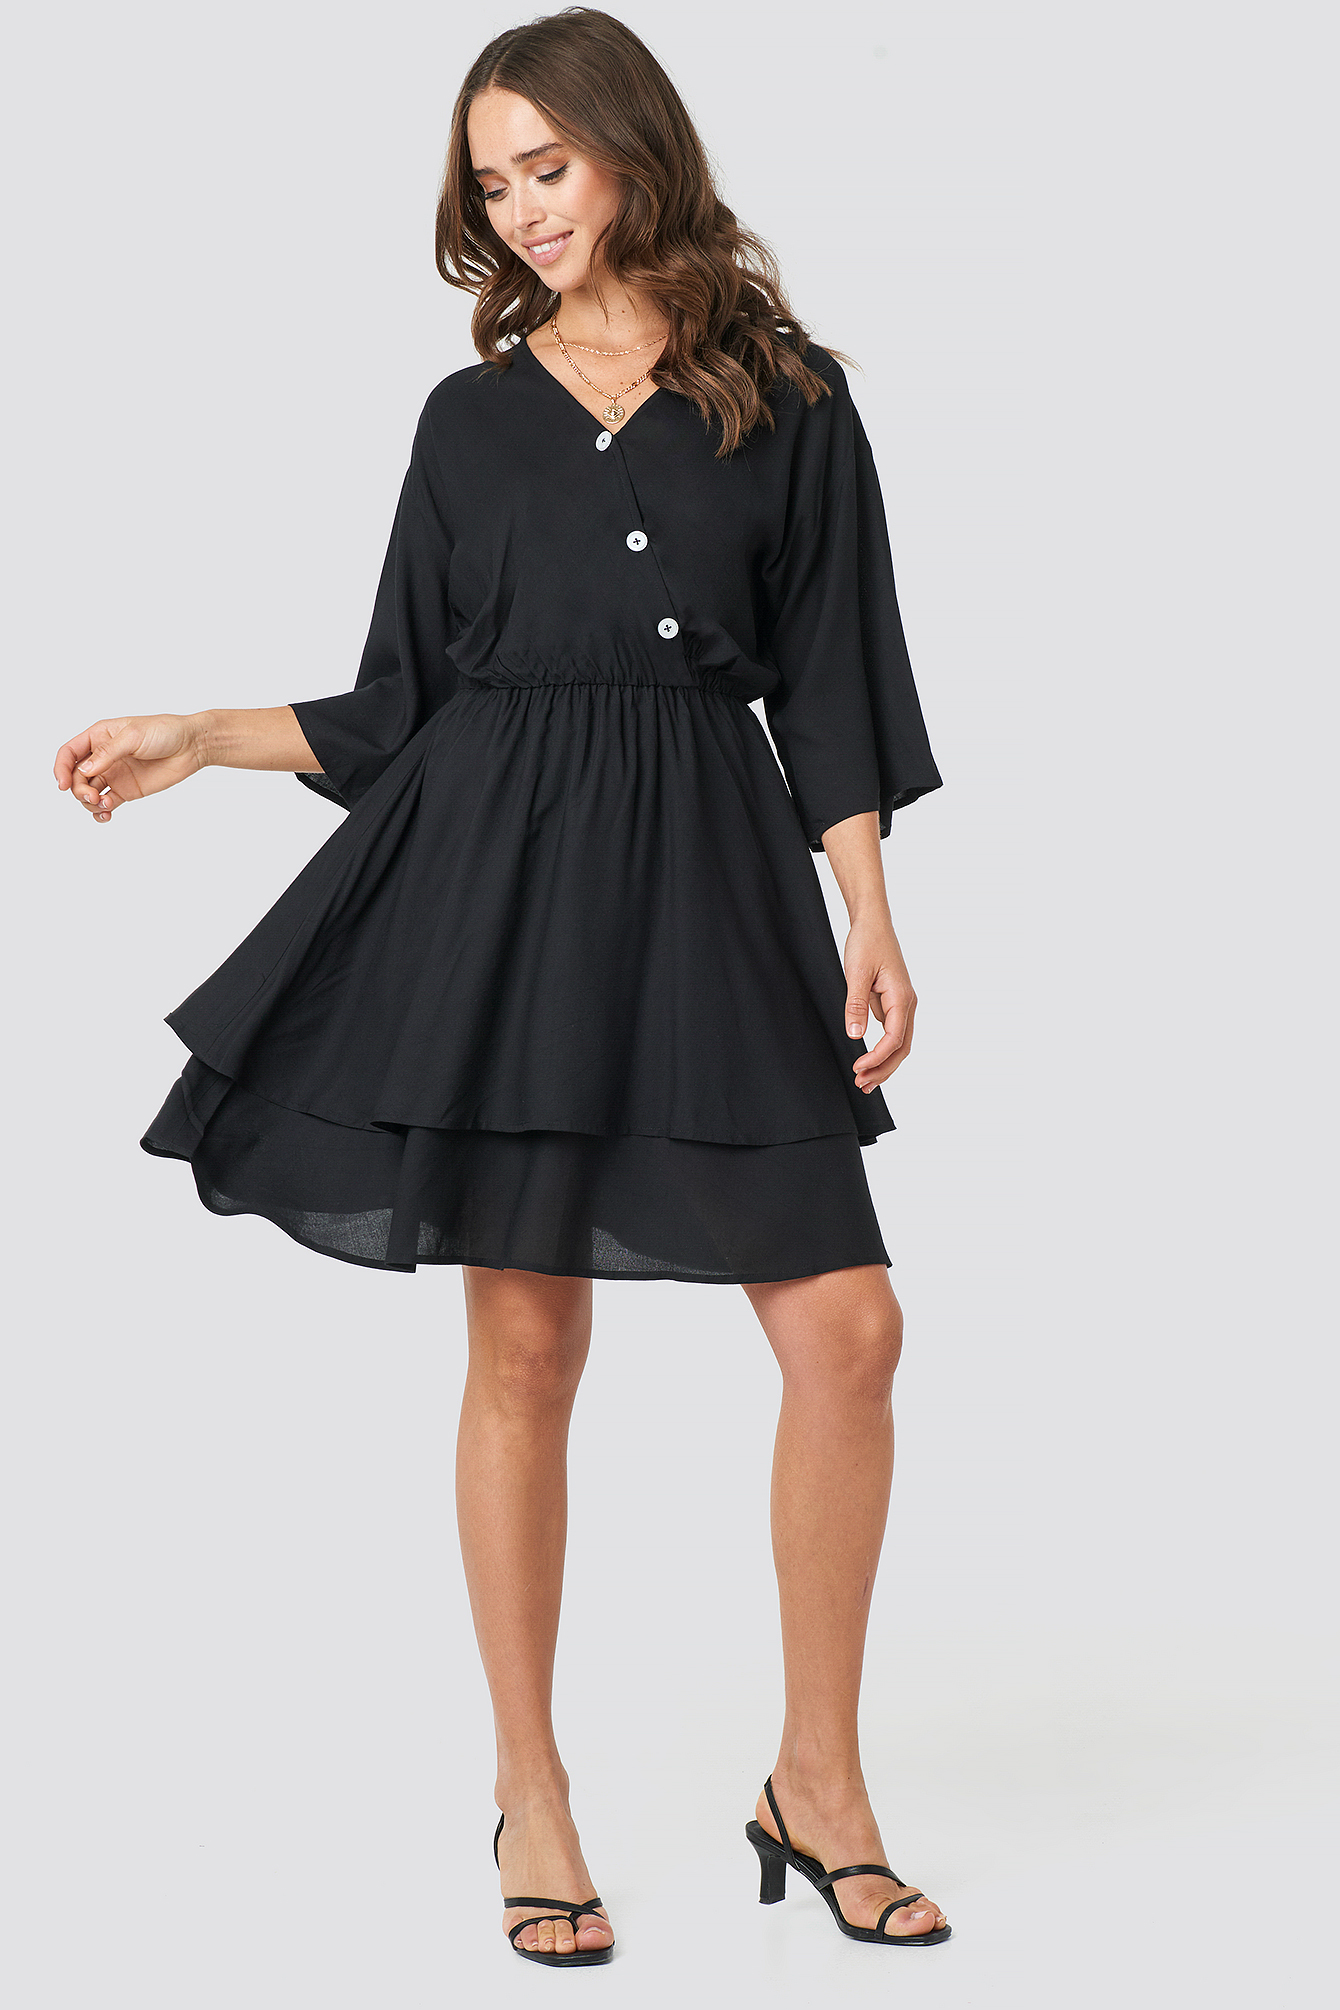 Contrast Button Layered Dress NA-KD.COM